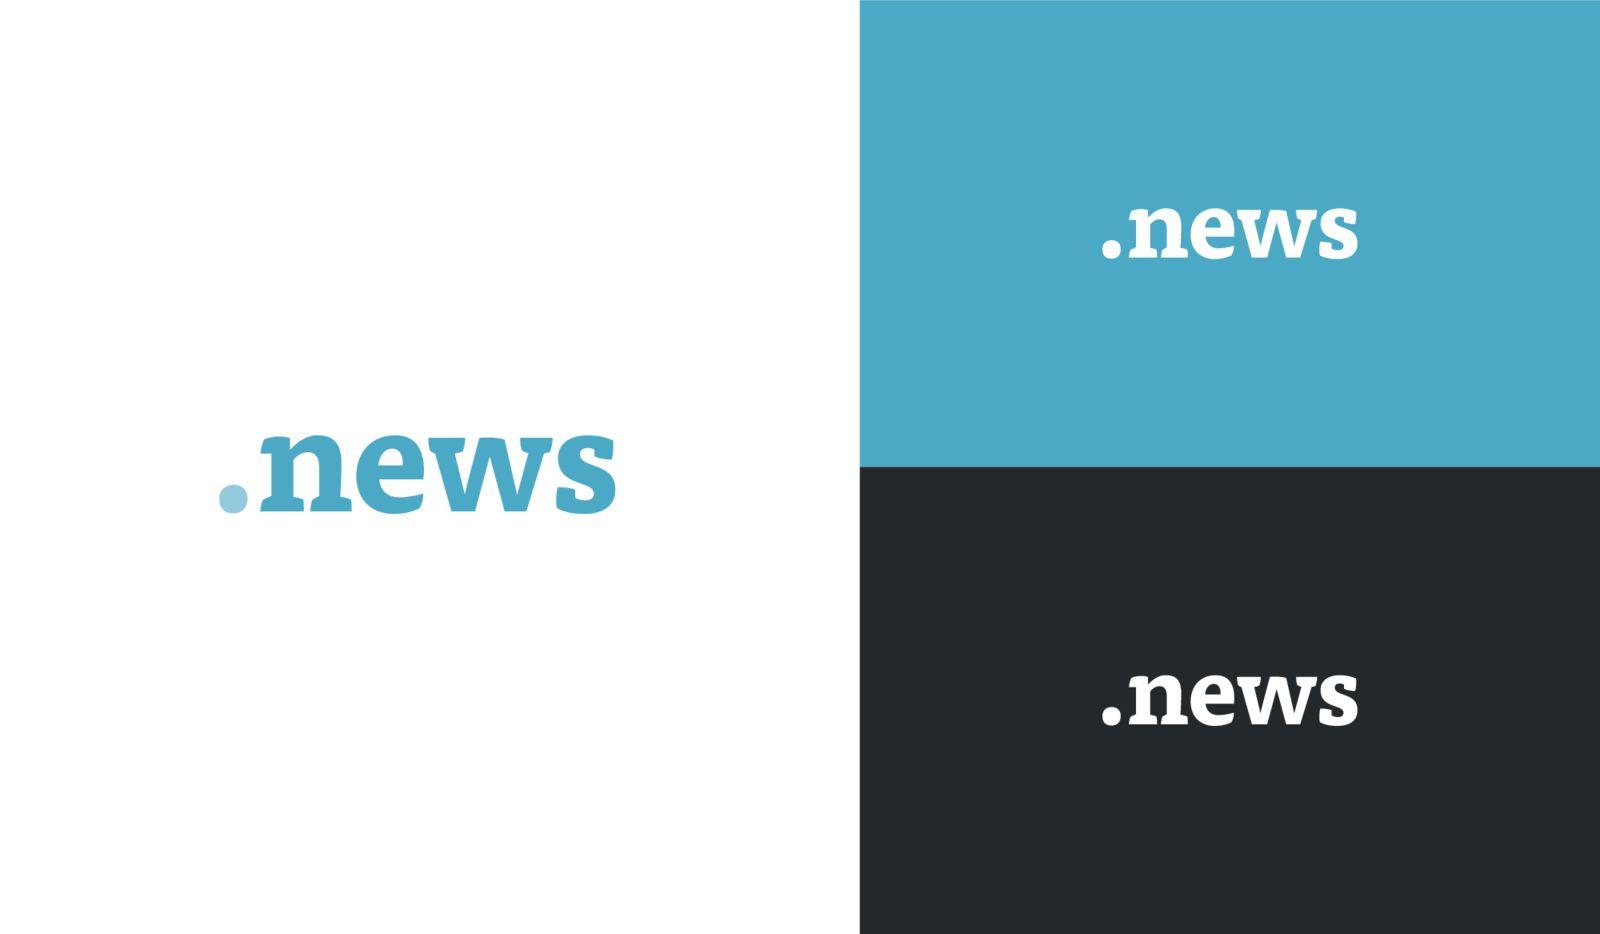 .NEWS TLD logo